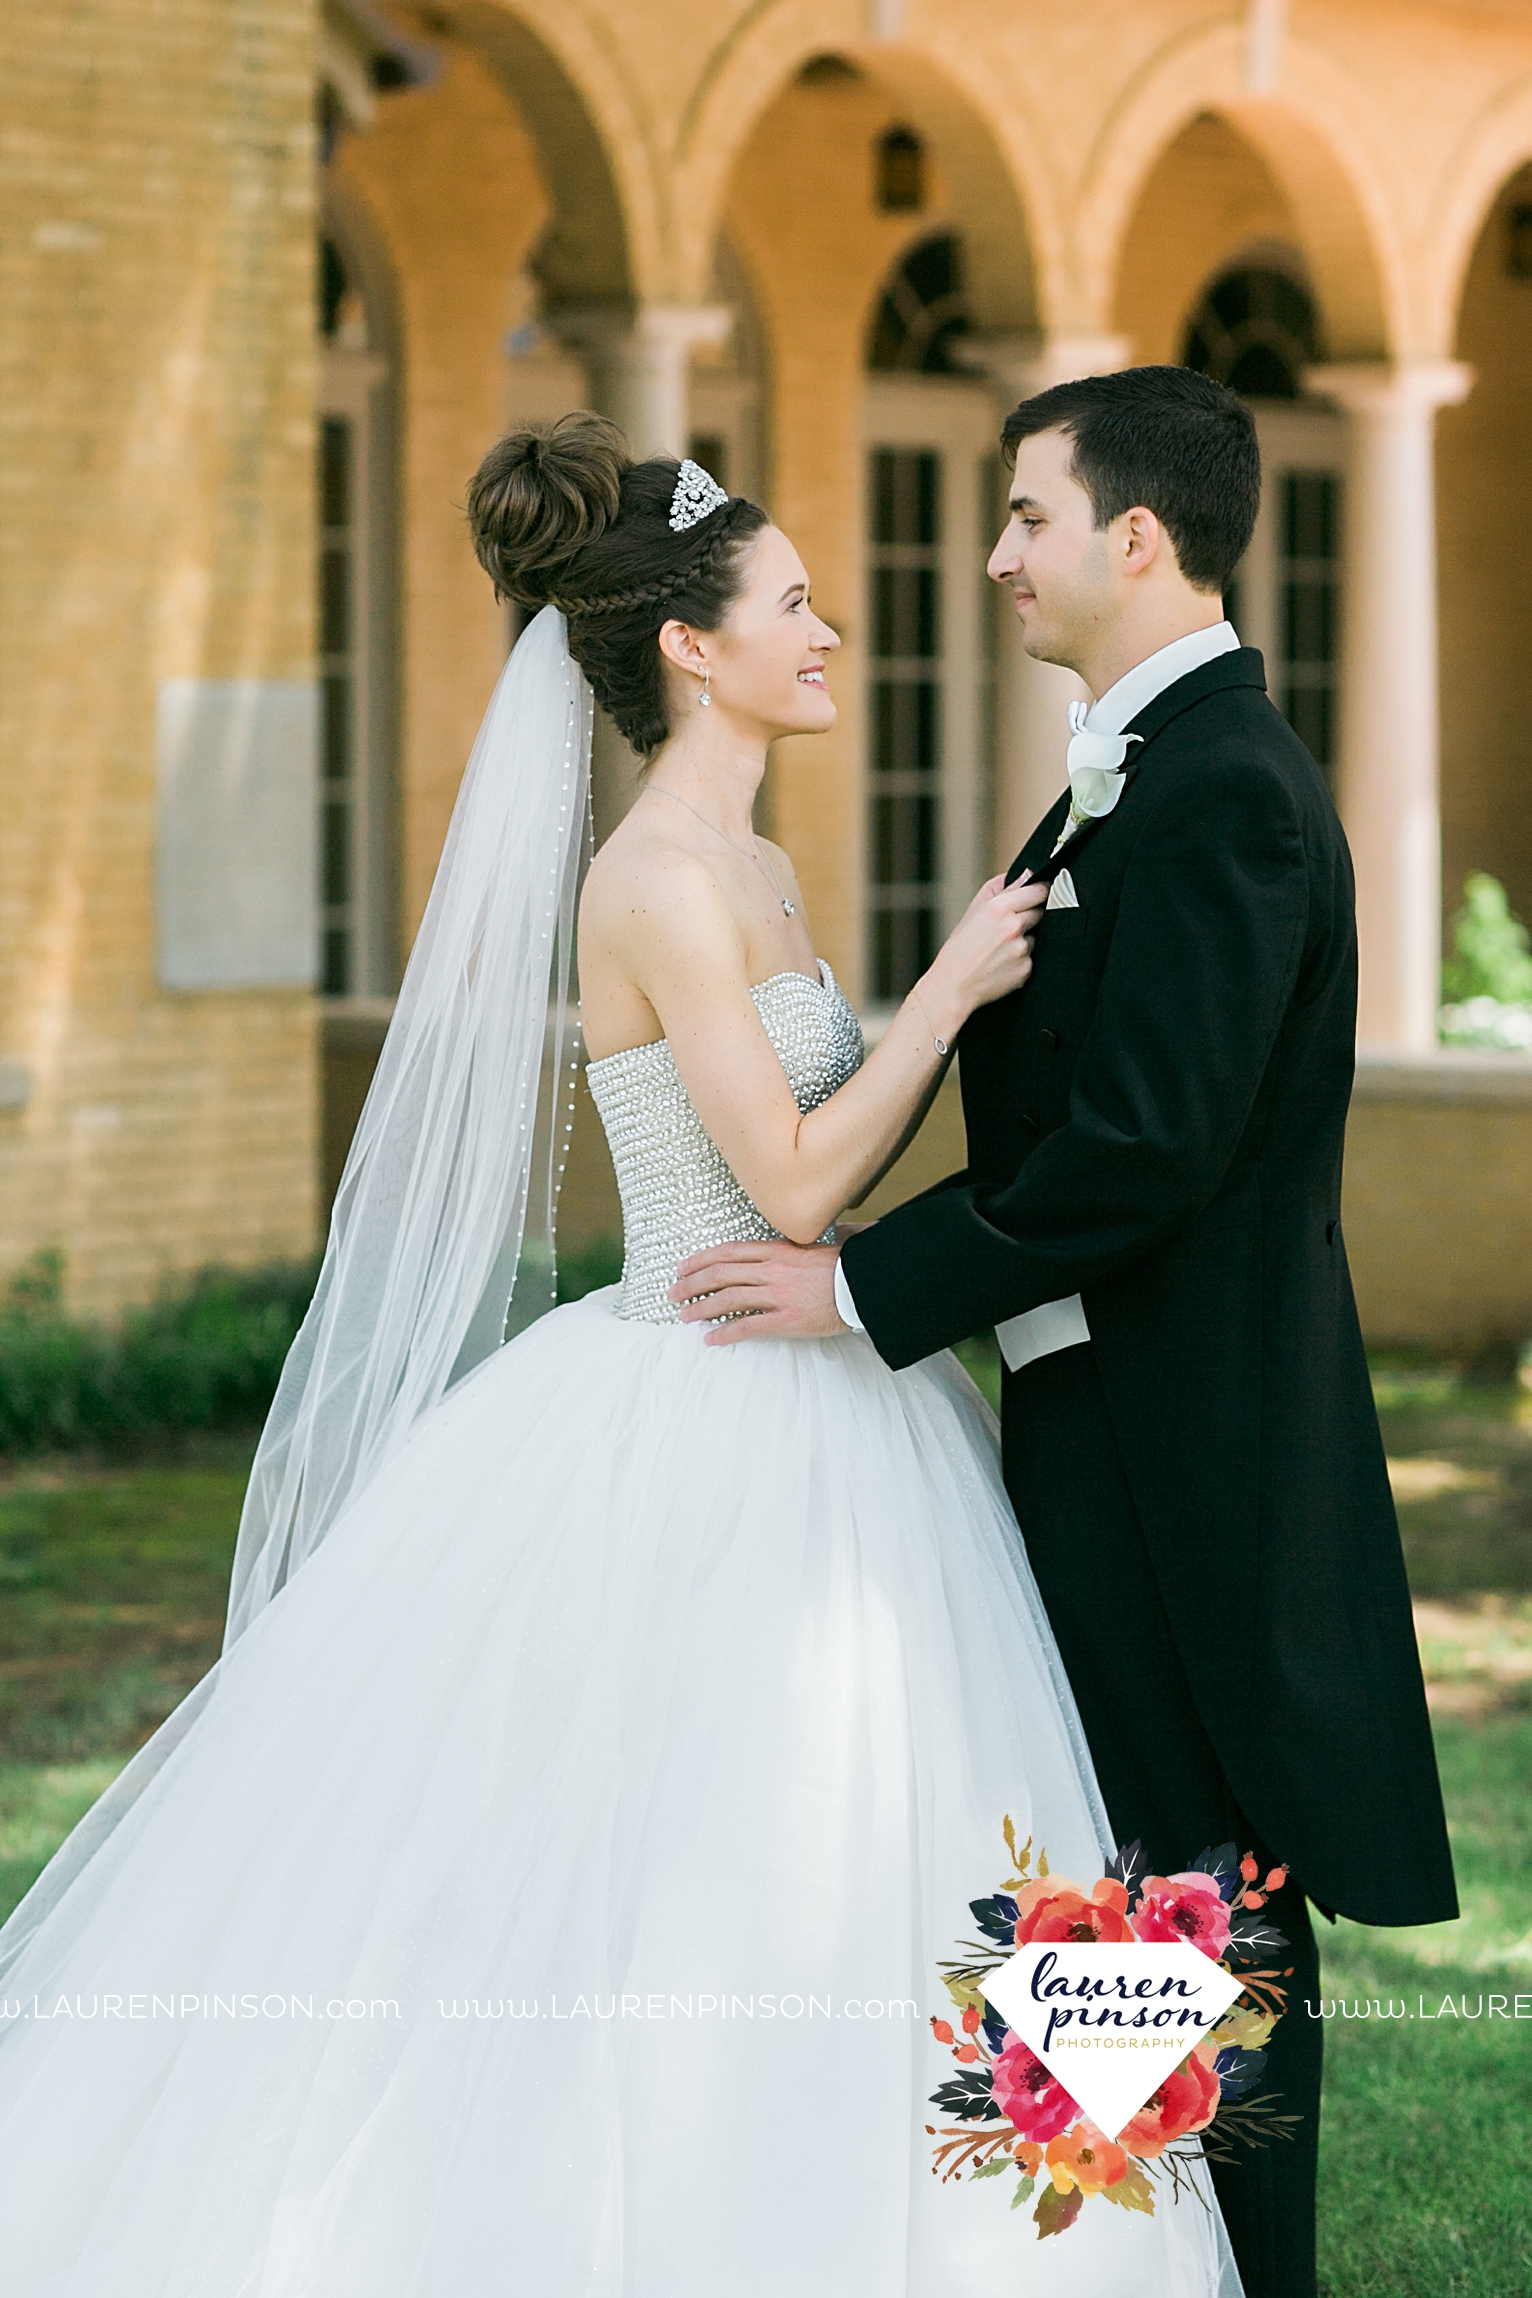 wichita-falls-texas-wedding-photographer-the-forum-by-the-kemp-mayfield-events-ulta-gold-glitter_2834.jpg